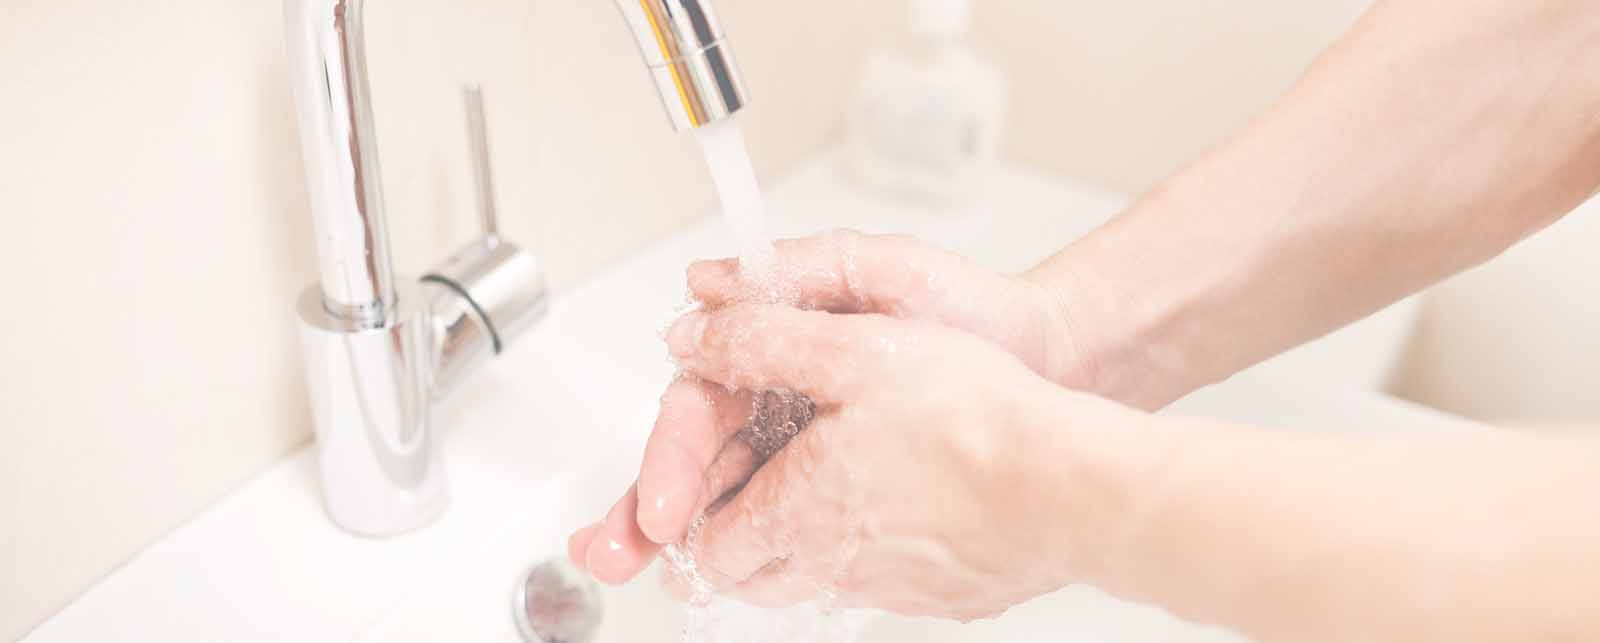 como-lavarse-manos